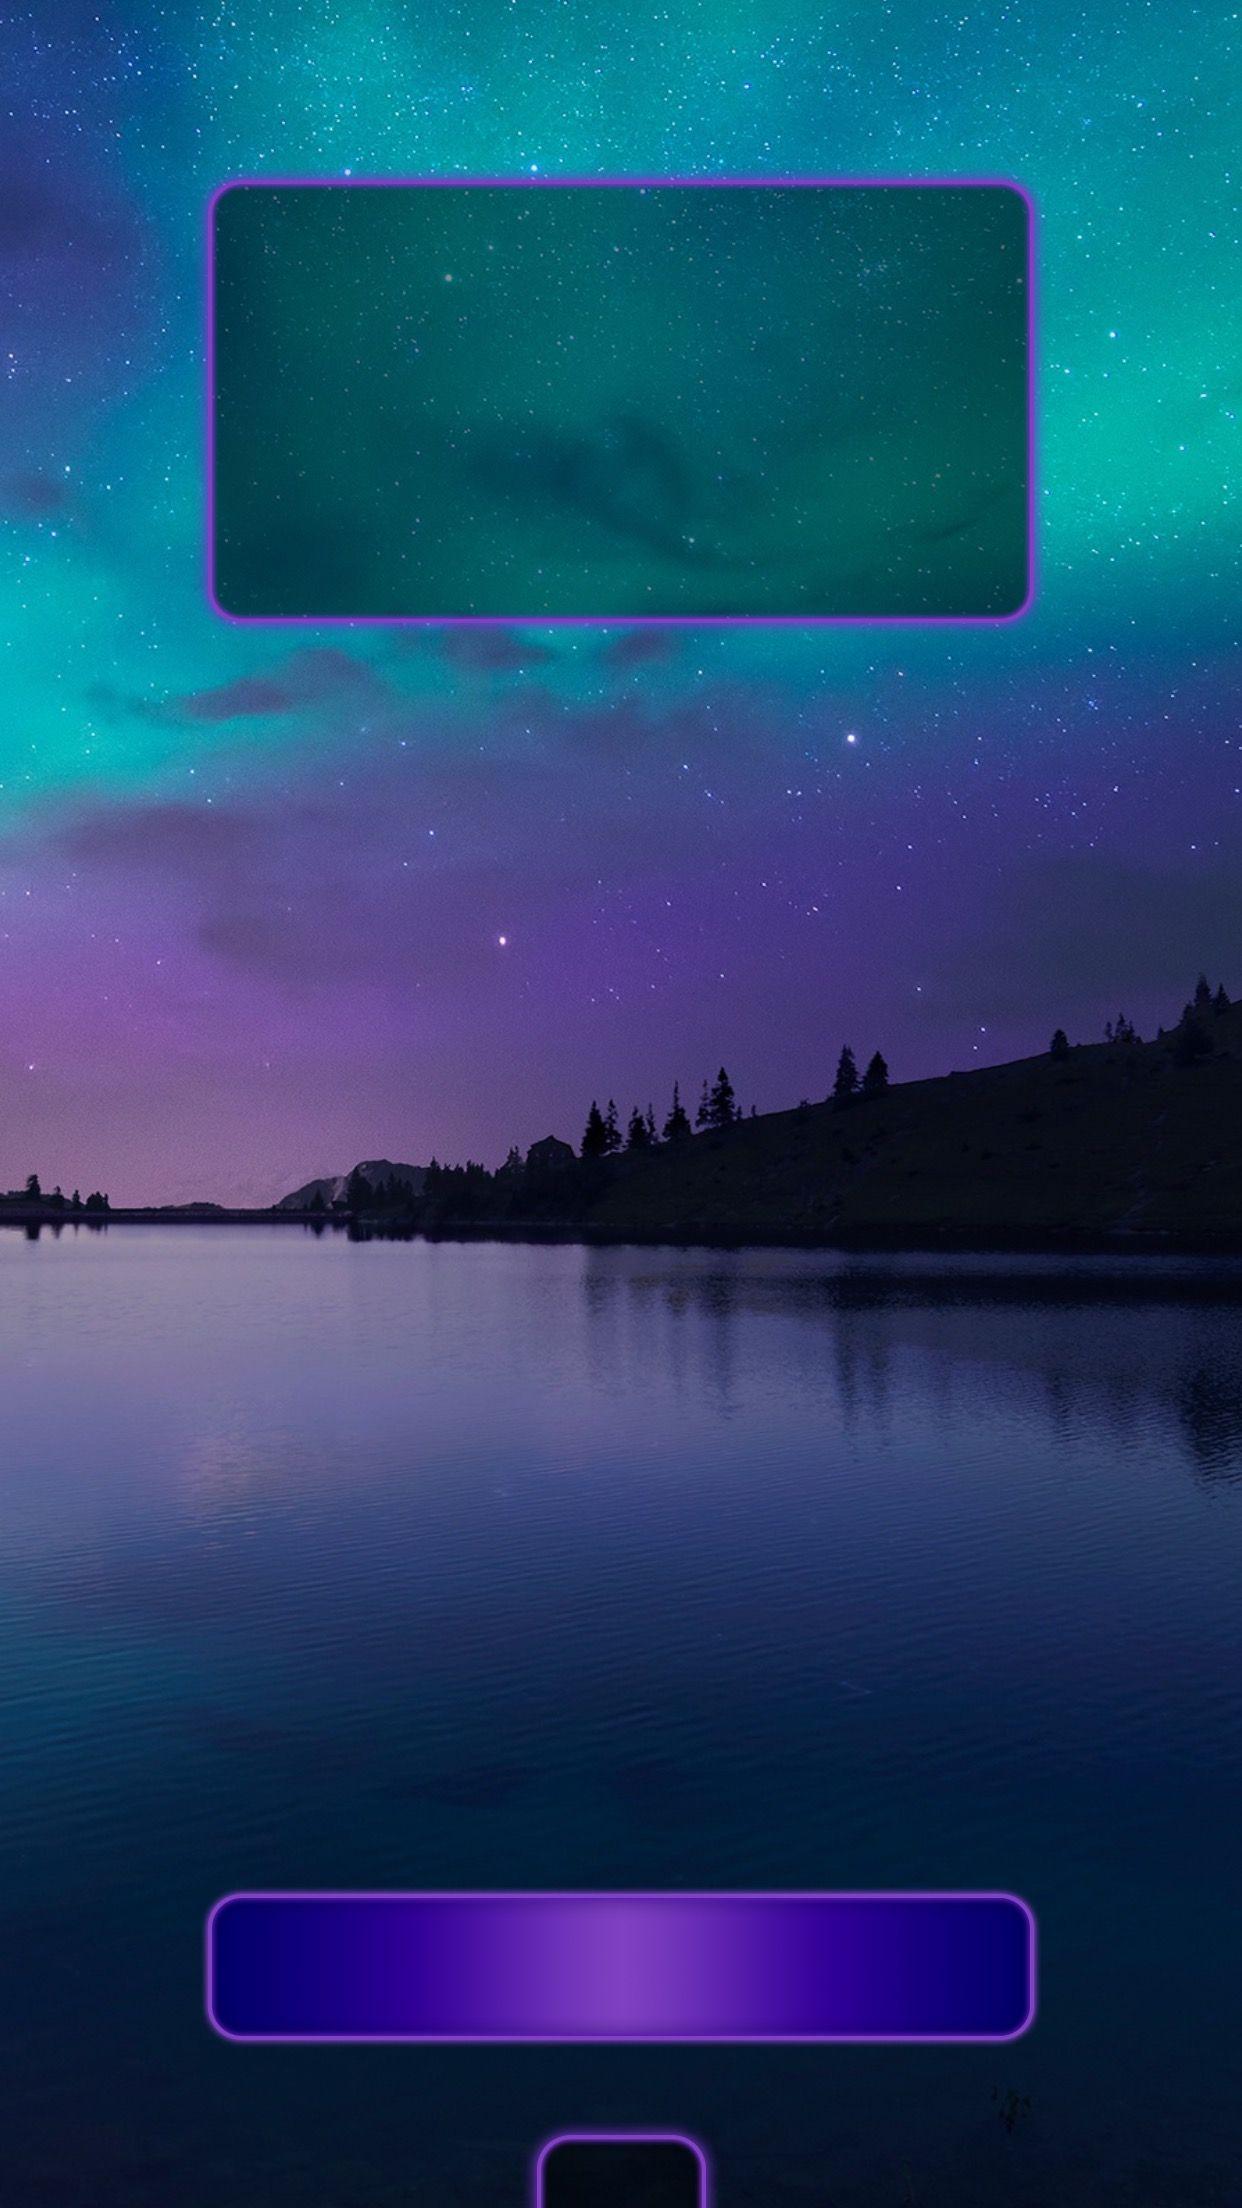 Cute Iphone Lock Screen Wallpaper Iphone Wallpapers